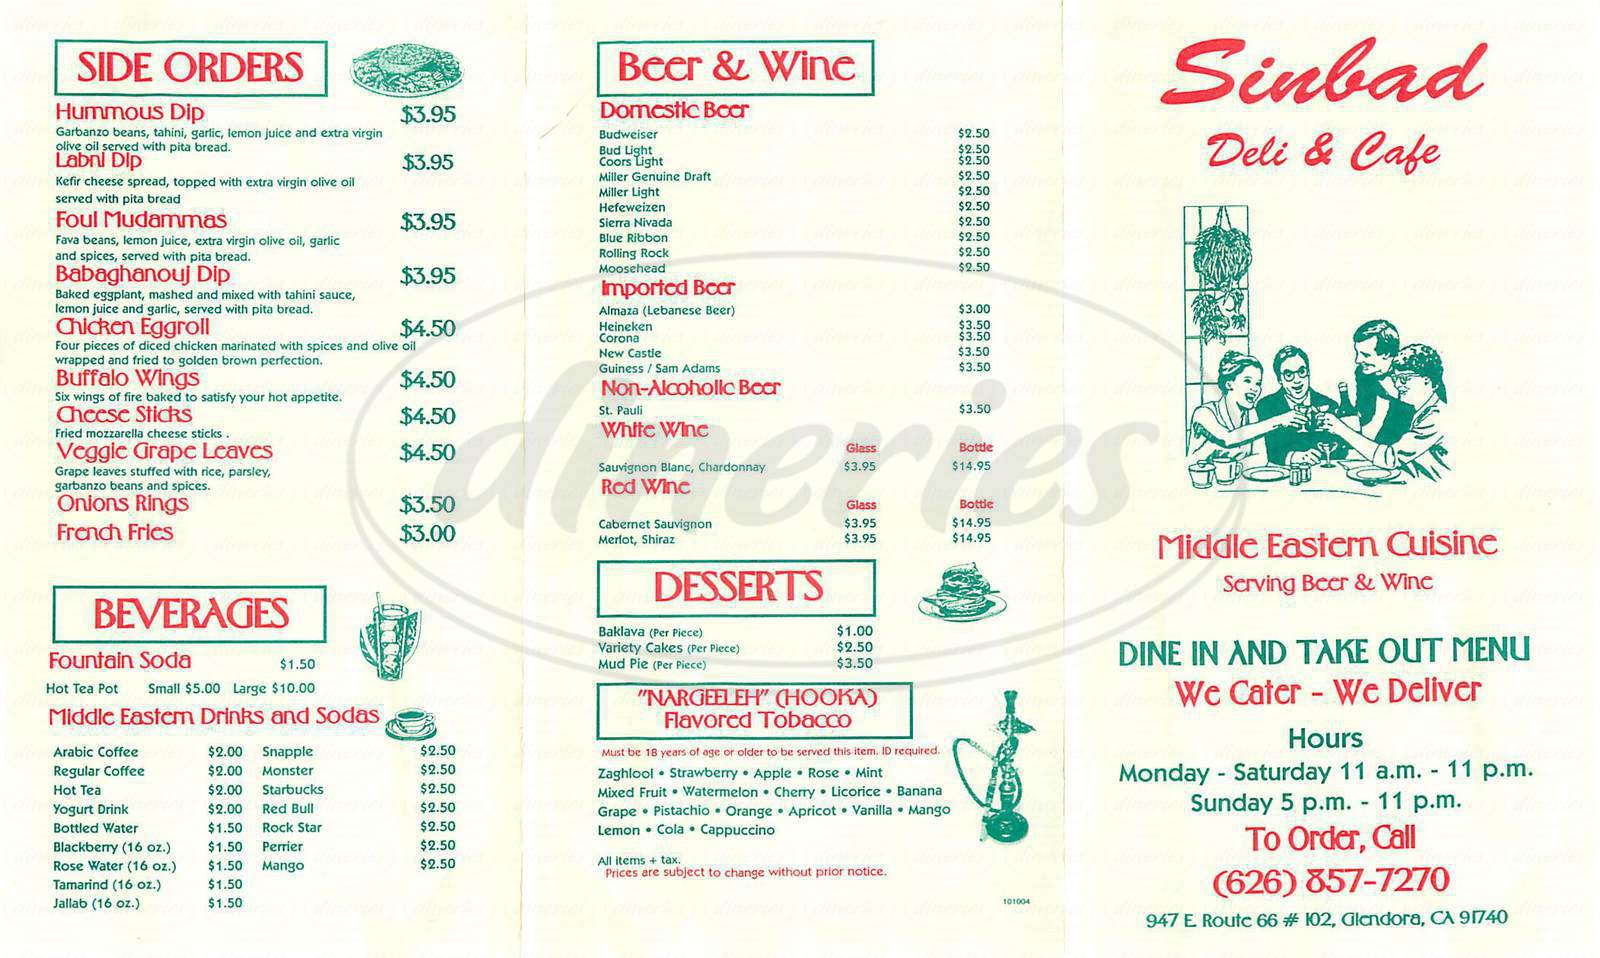 menu for Sinbad Deli & Café